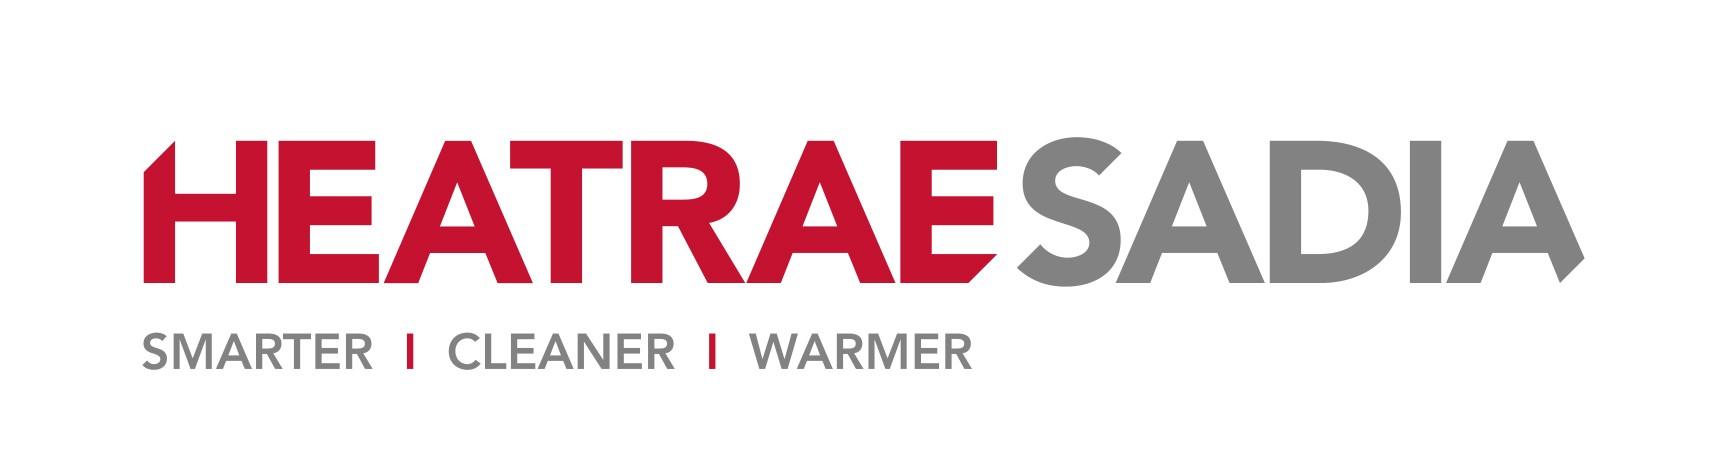 heatrae_logo_1_1_1.jpg